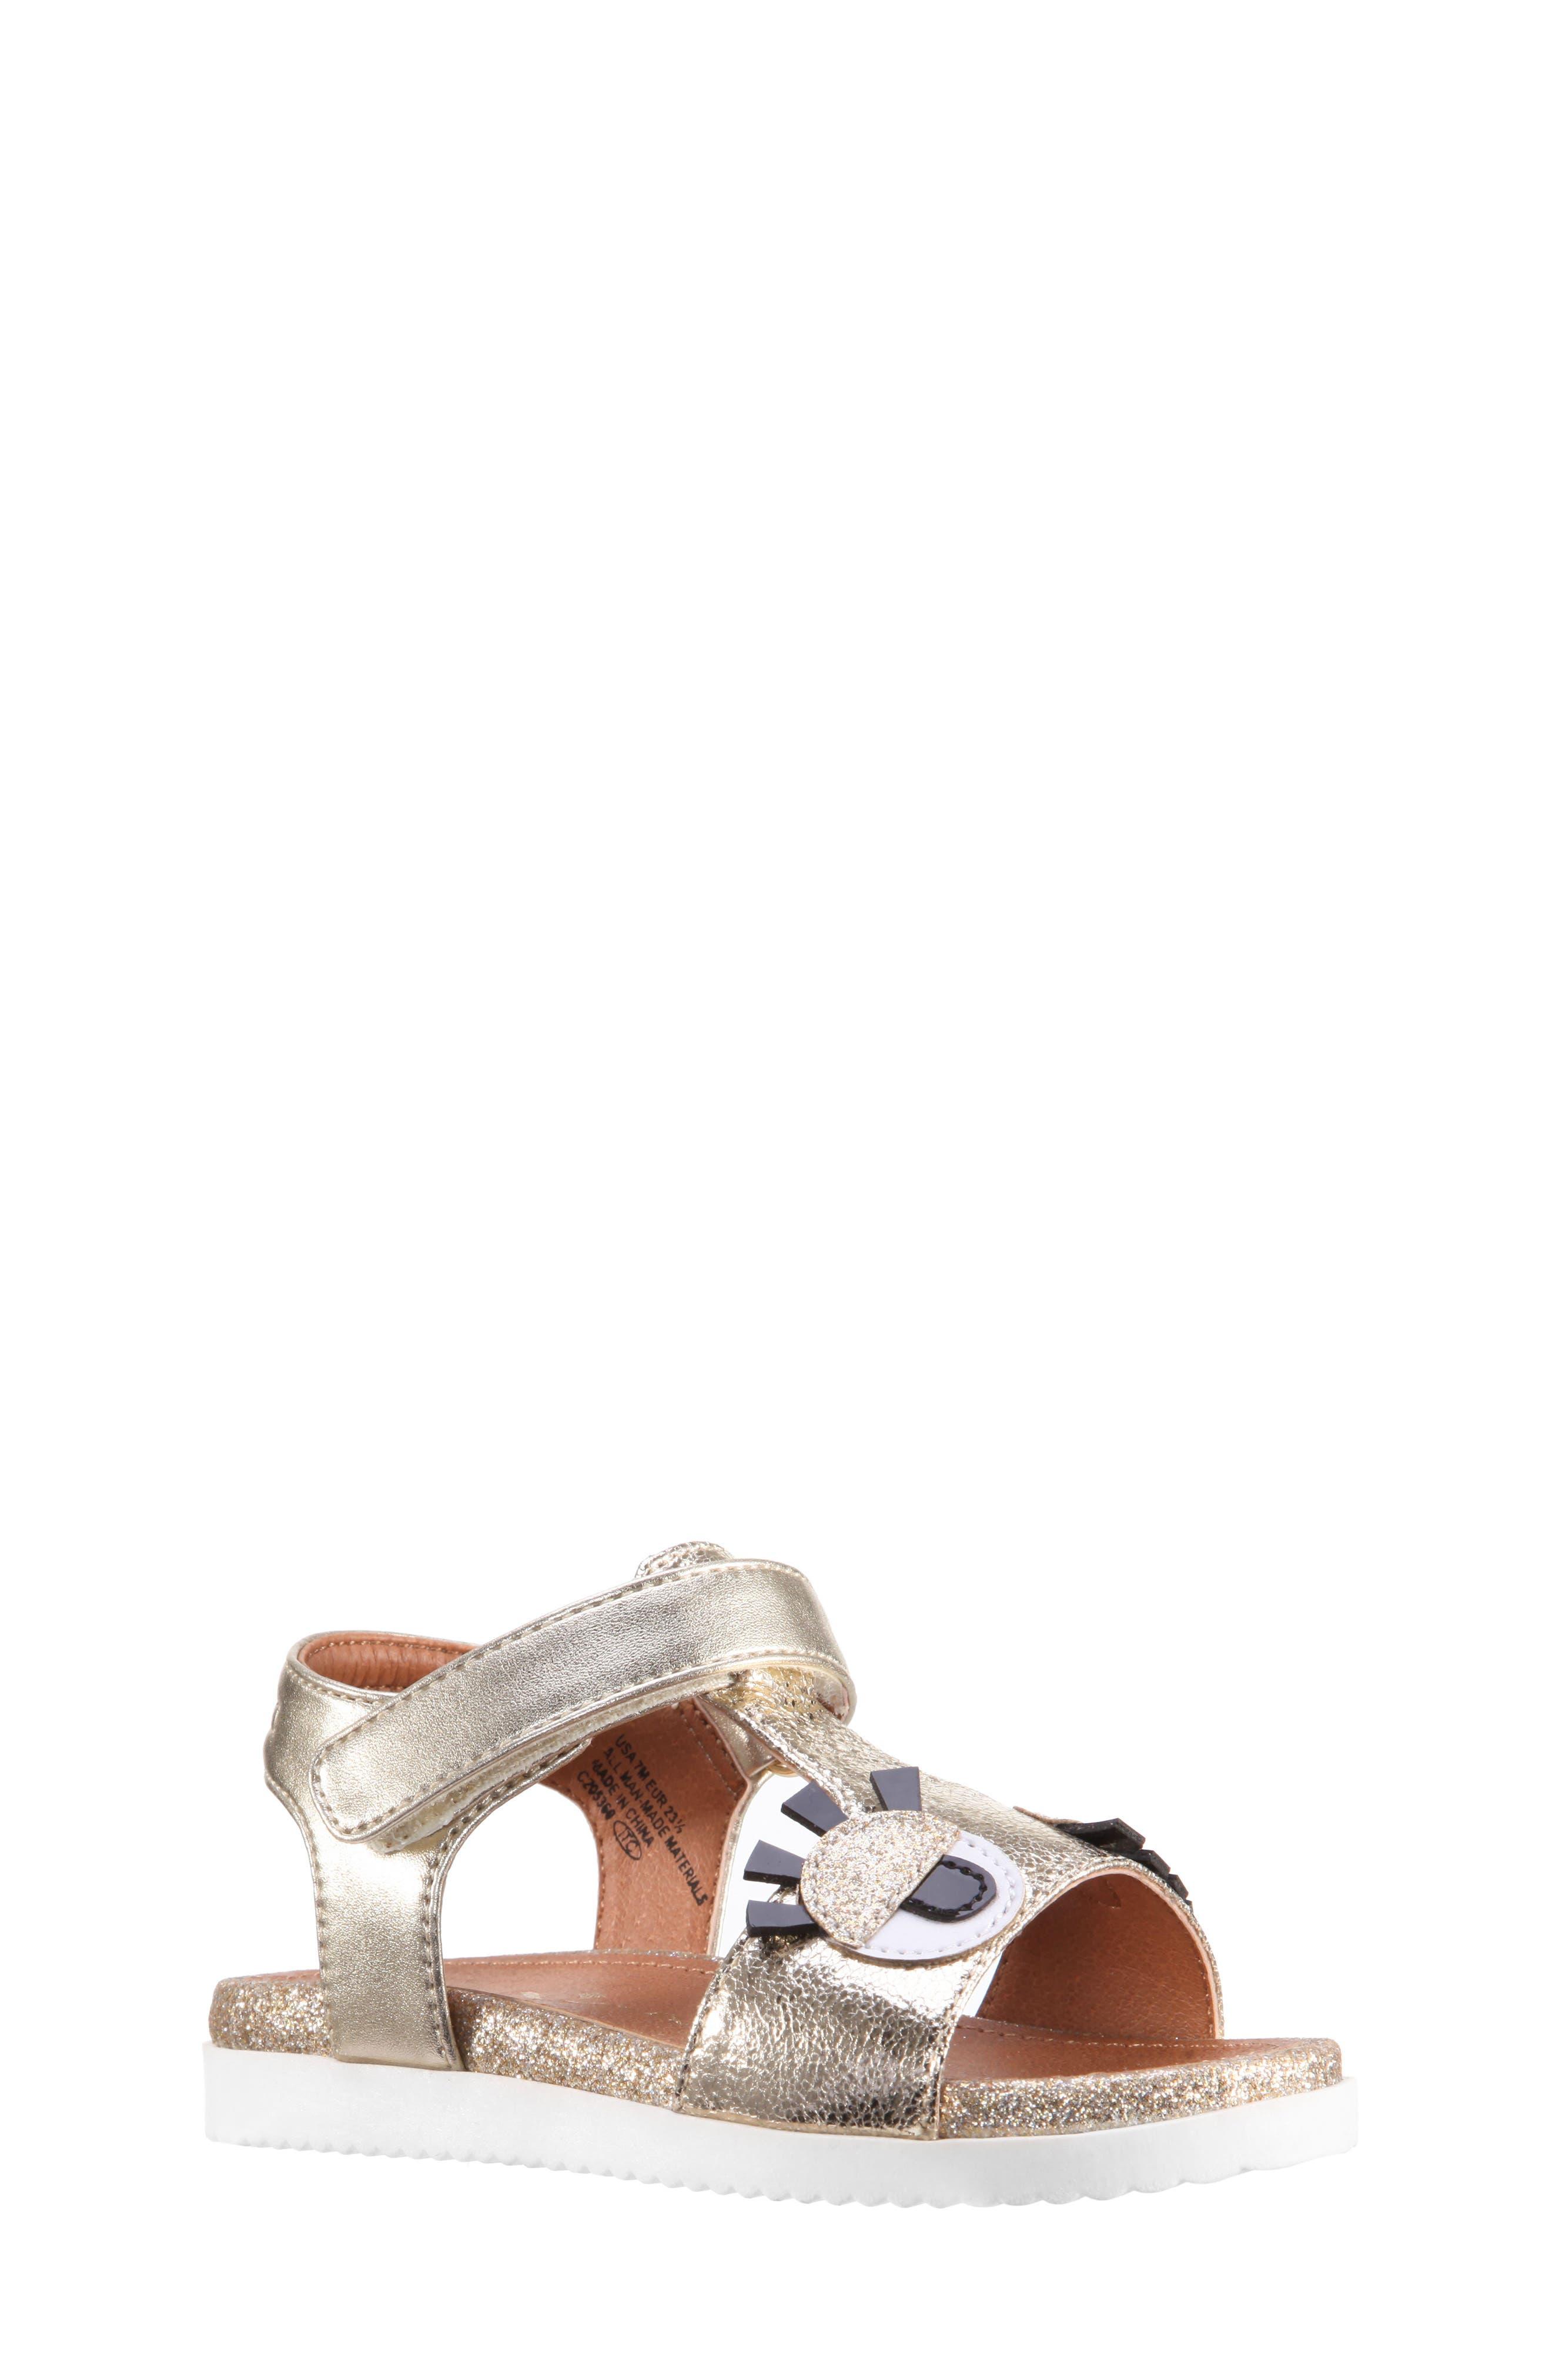 Luciella Wink Sandal,                             Main thumbnail 1, color,                             Platino Metallic Crackle